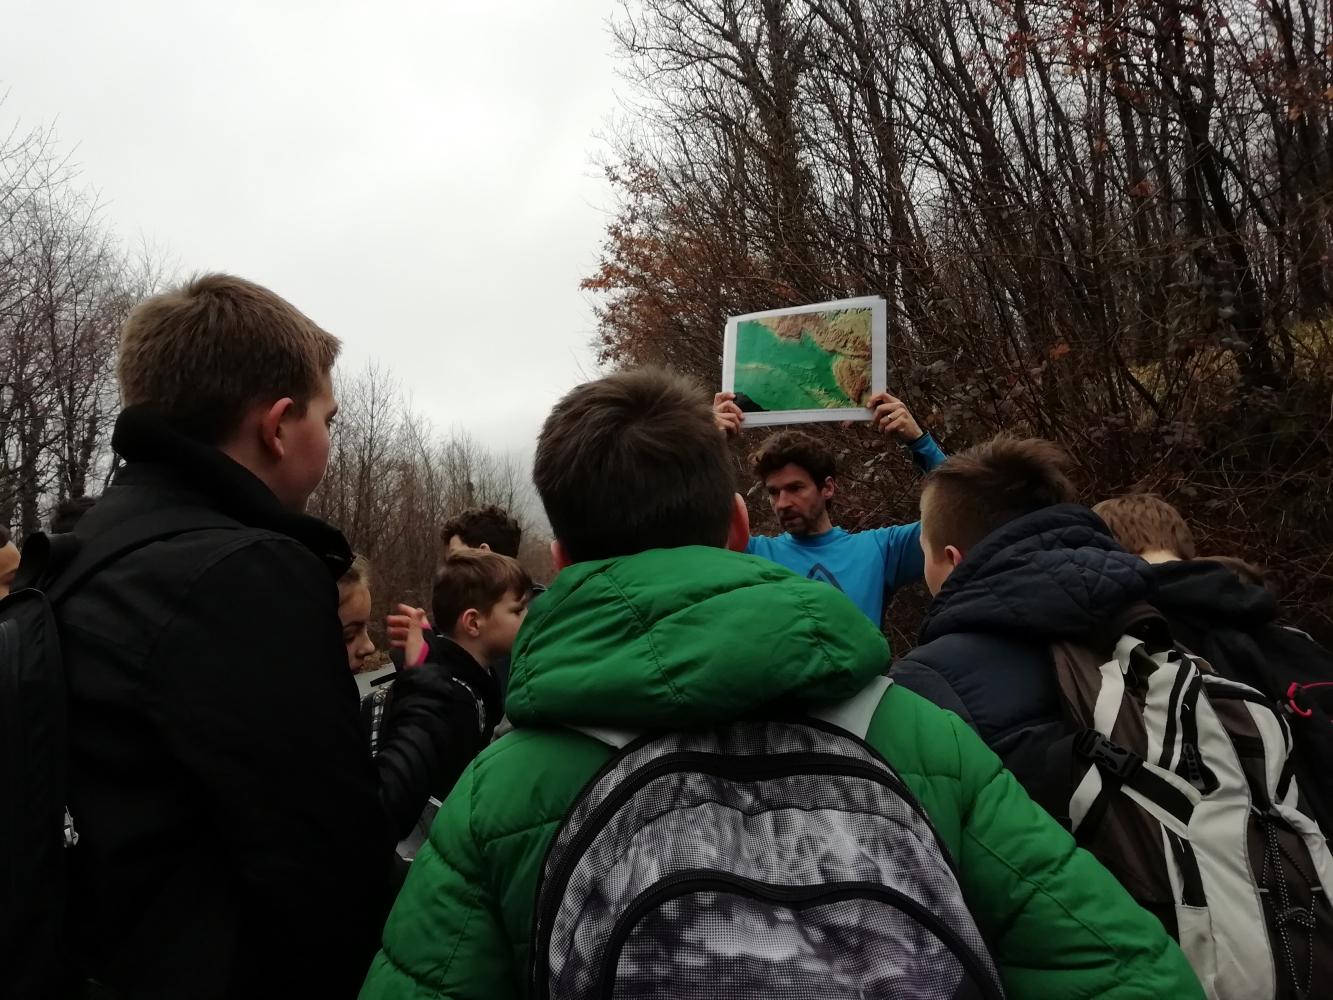 plazovi-v-vipavski-dolini-ekskurzija